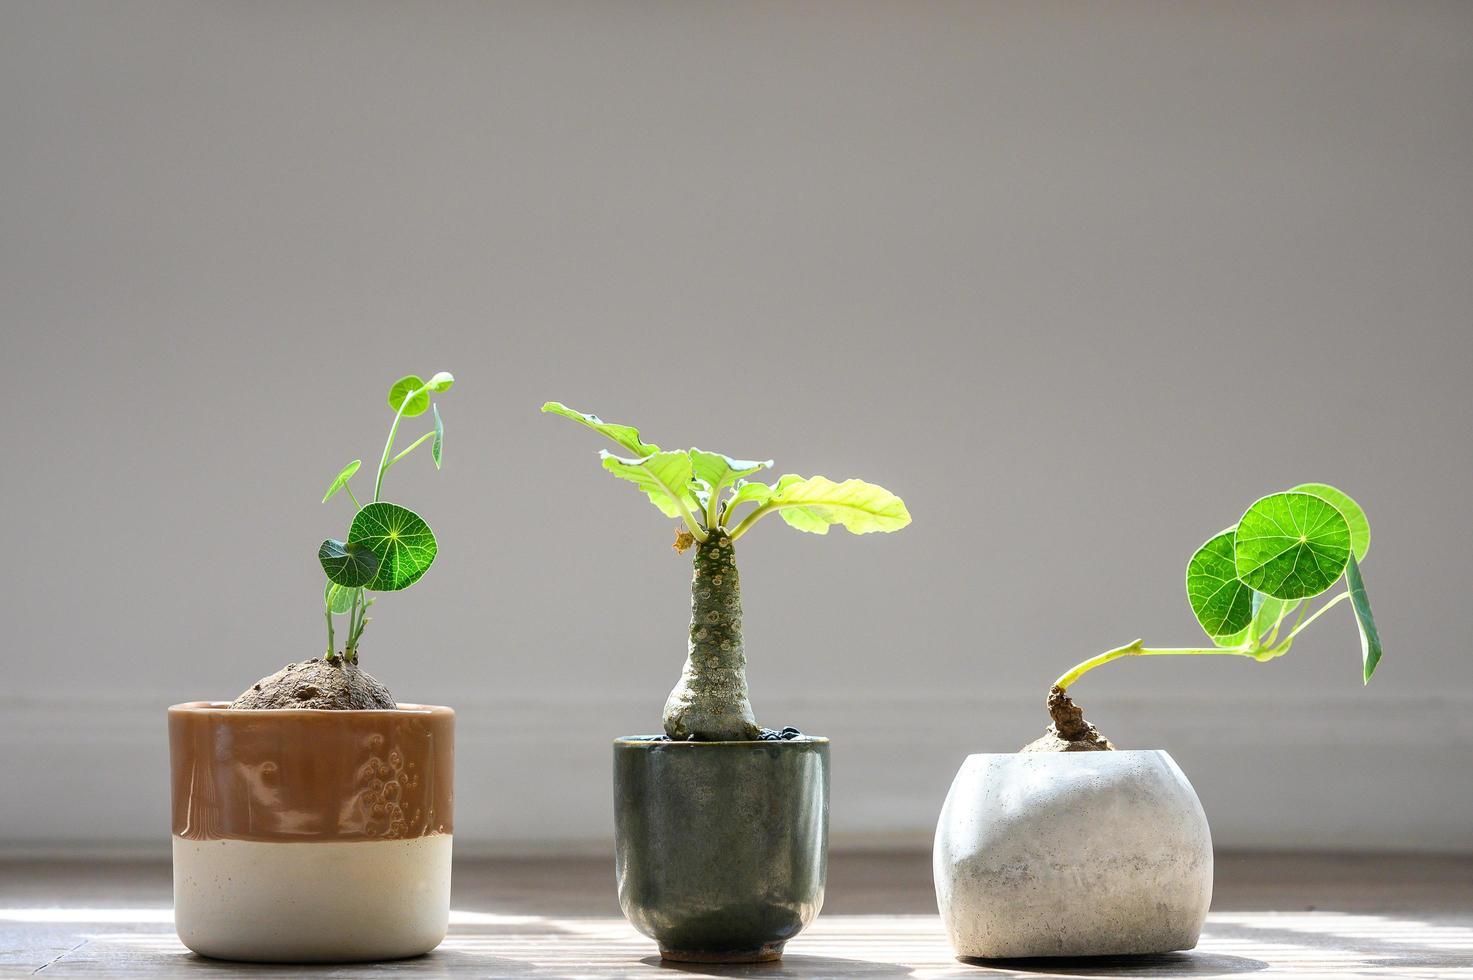 Stephania erecta and Dorstenia plant under the sunlight photo